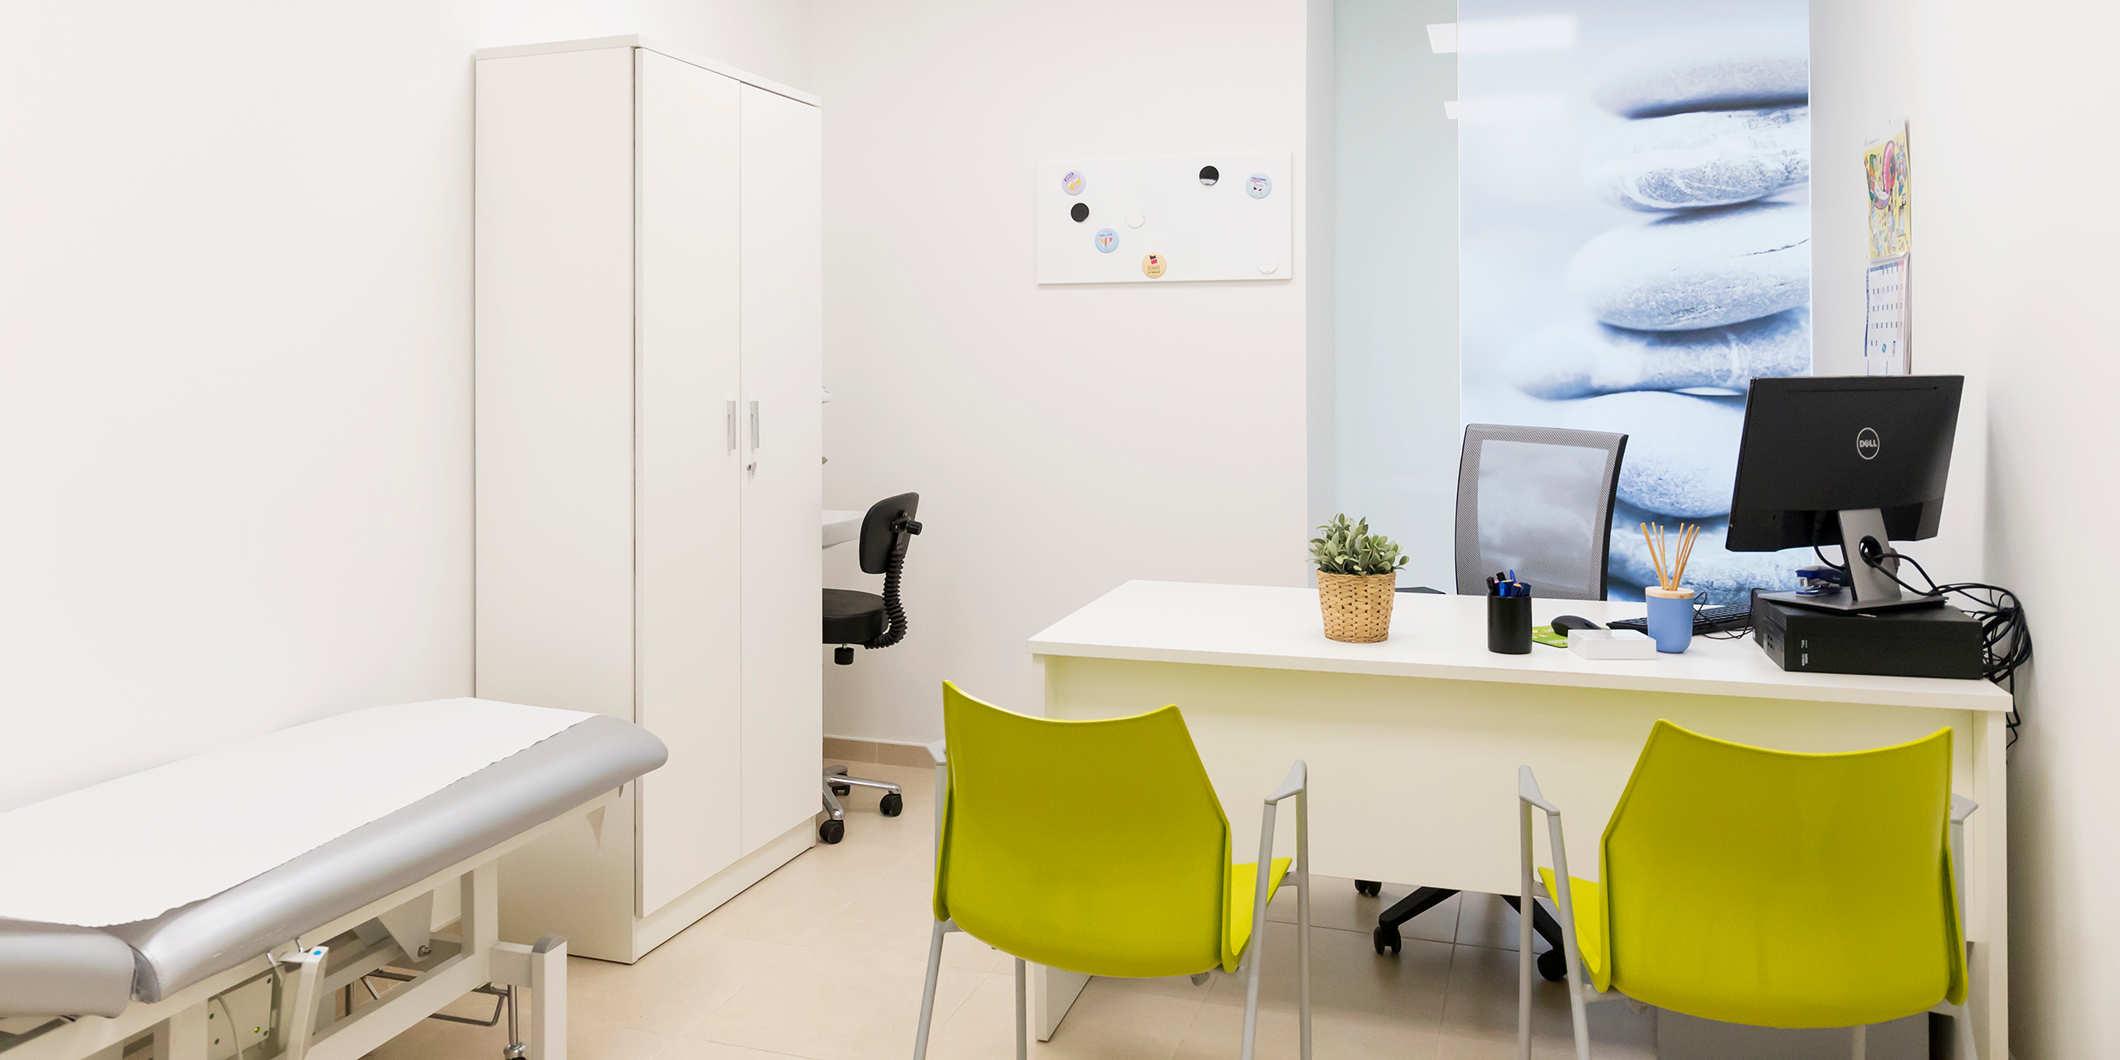 Consulta Médica. Hospital Gijón